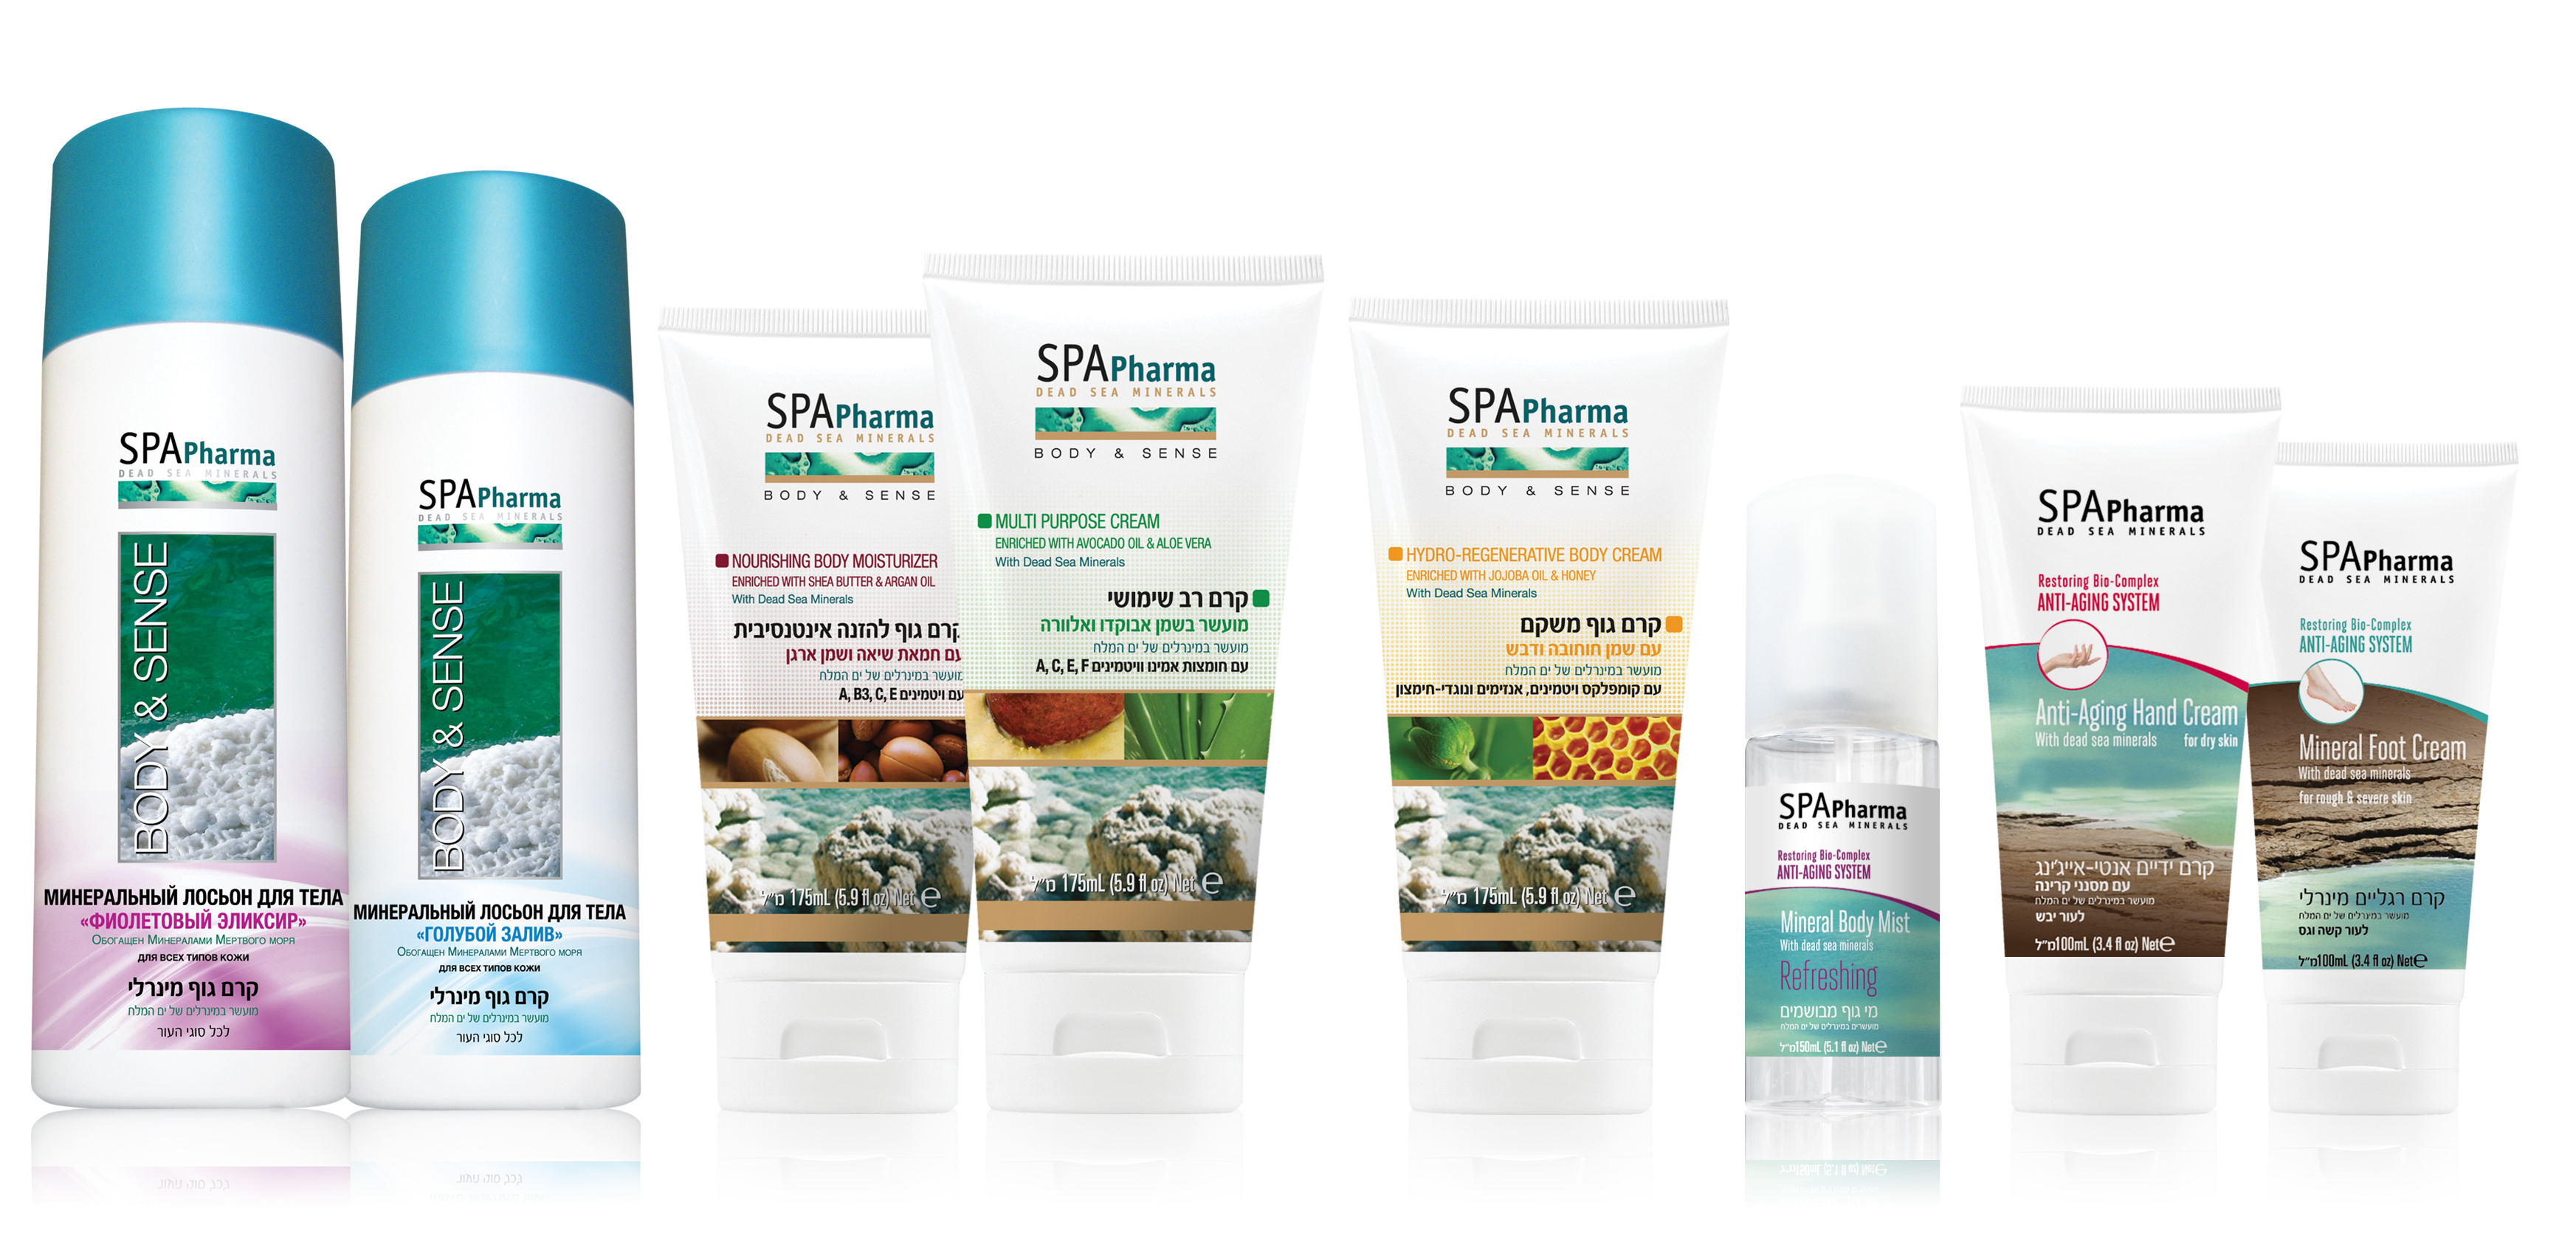 SPApharma Dead Sea Minerals